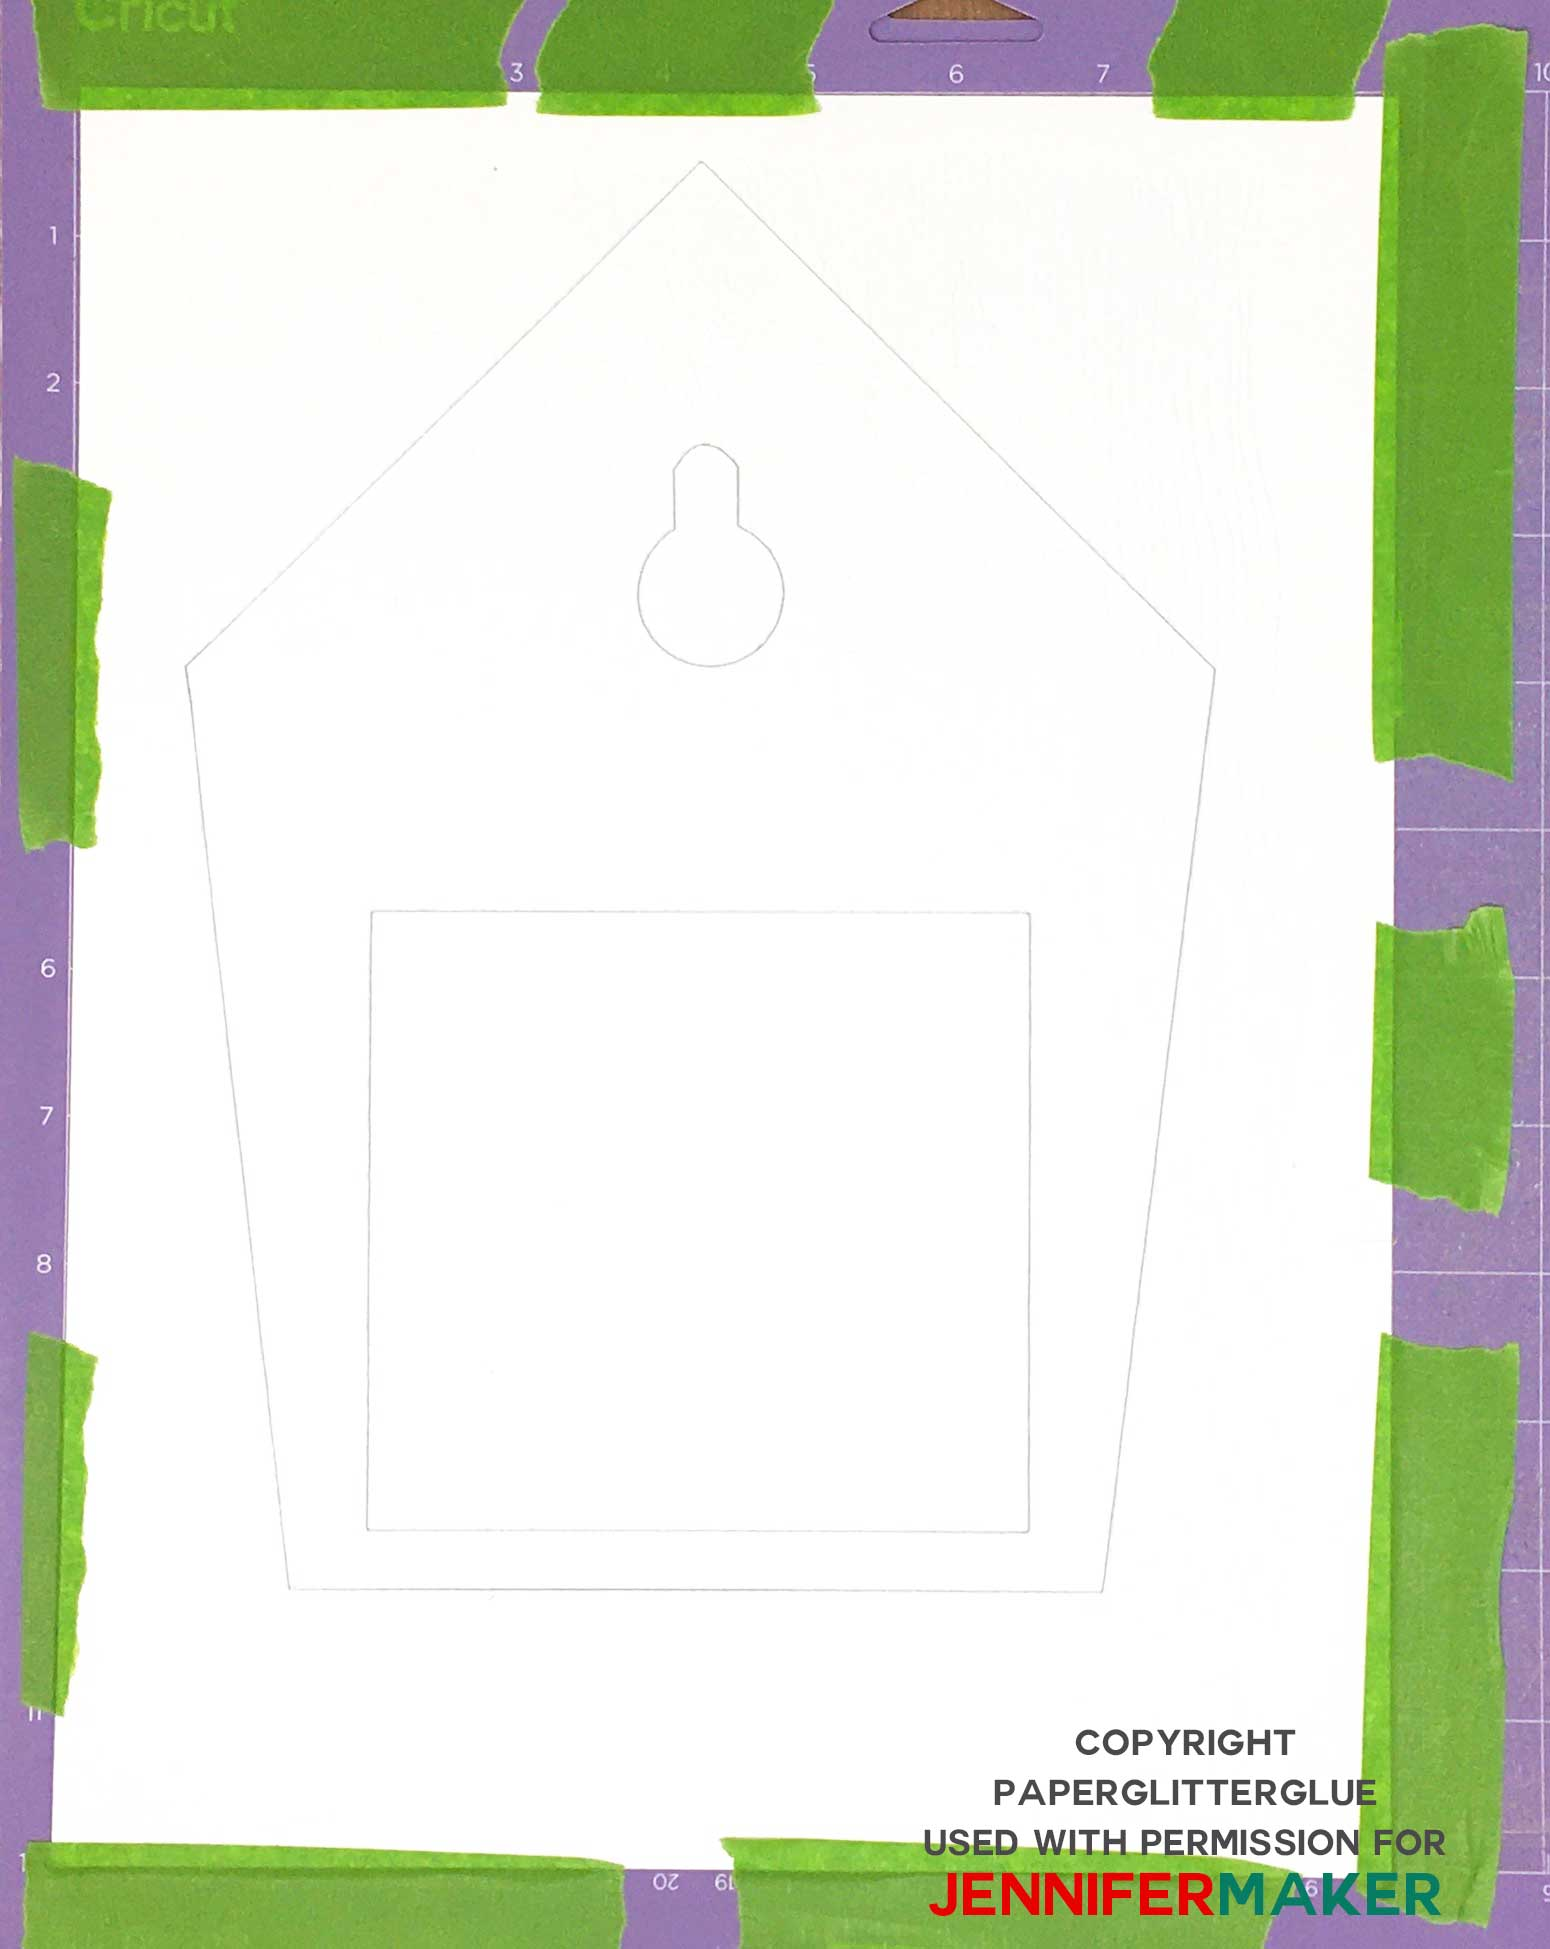 Watercolor paper on Cricut cutting mat for DIY cuckoo clock.